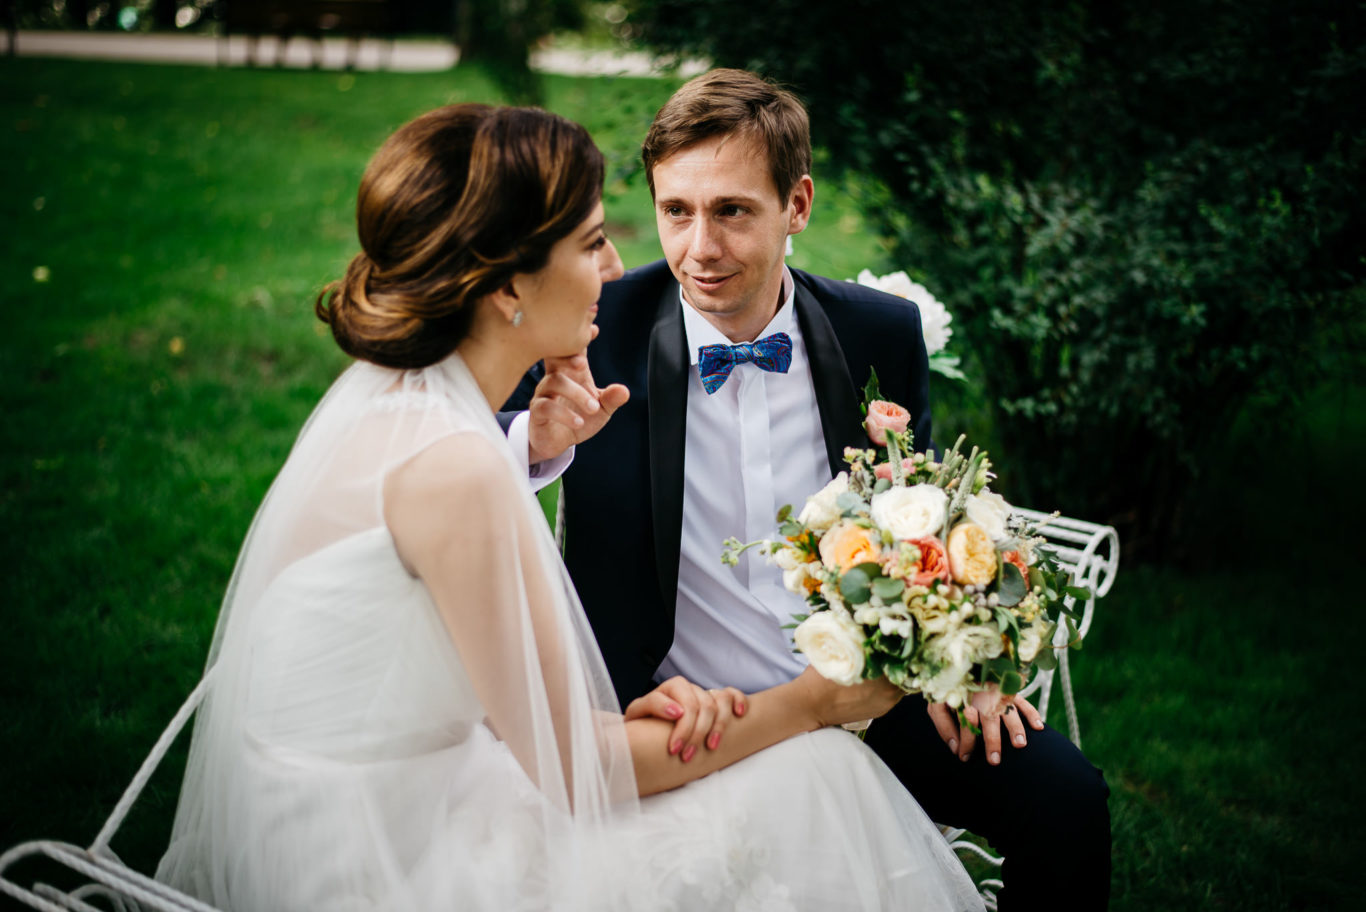 0499-Fotografie-nunta-Bucuresti-Oana-Catalin-fotograf-Ciprian-Dumitrescu-DSC_4510